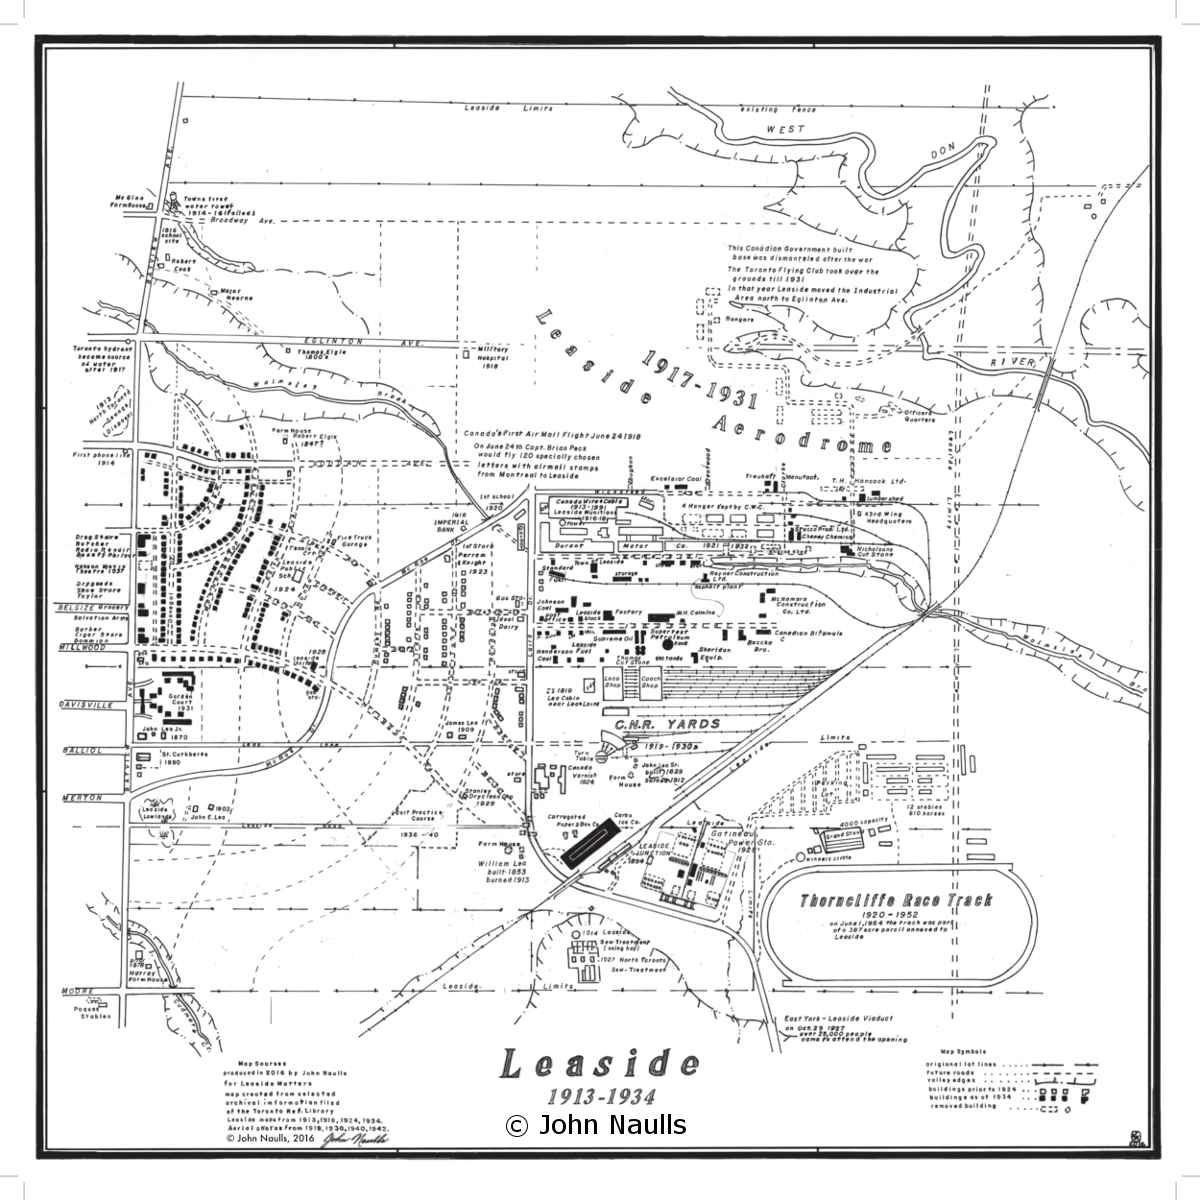 Map of Leaside 1913-1934